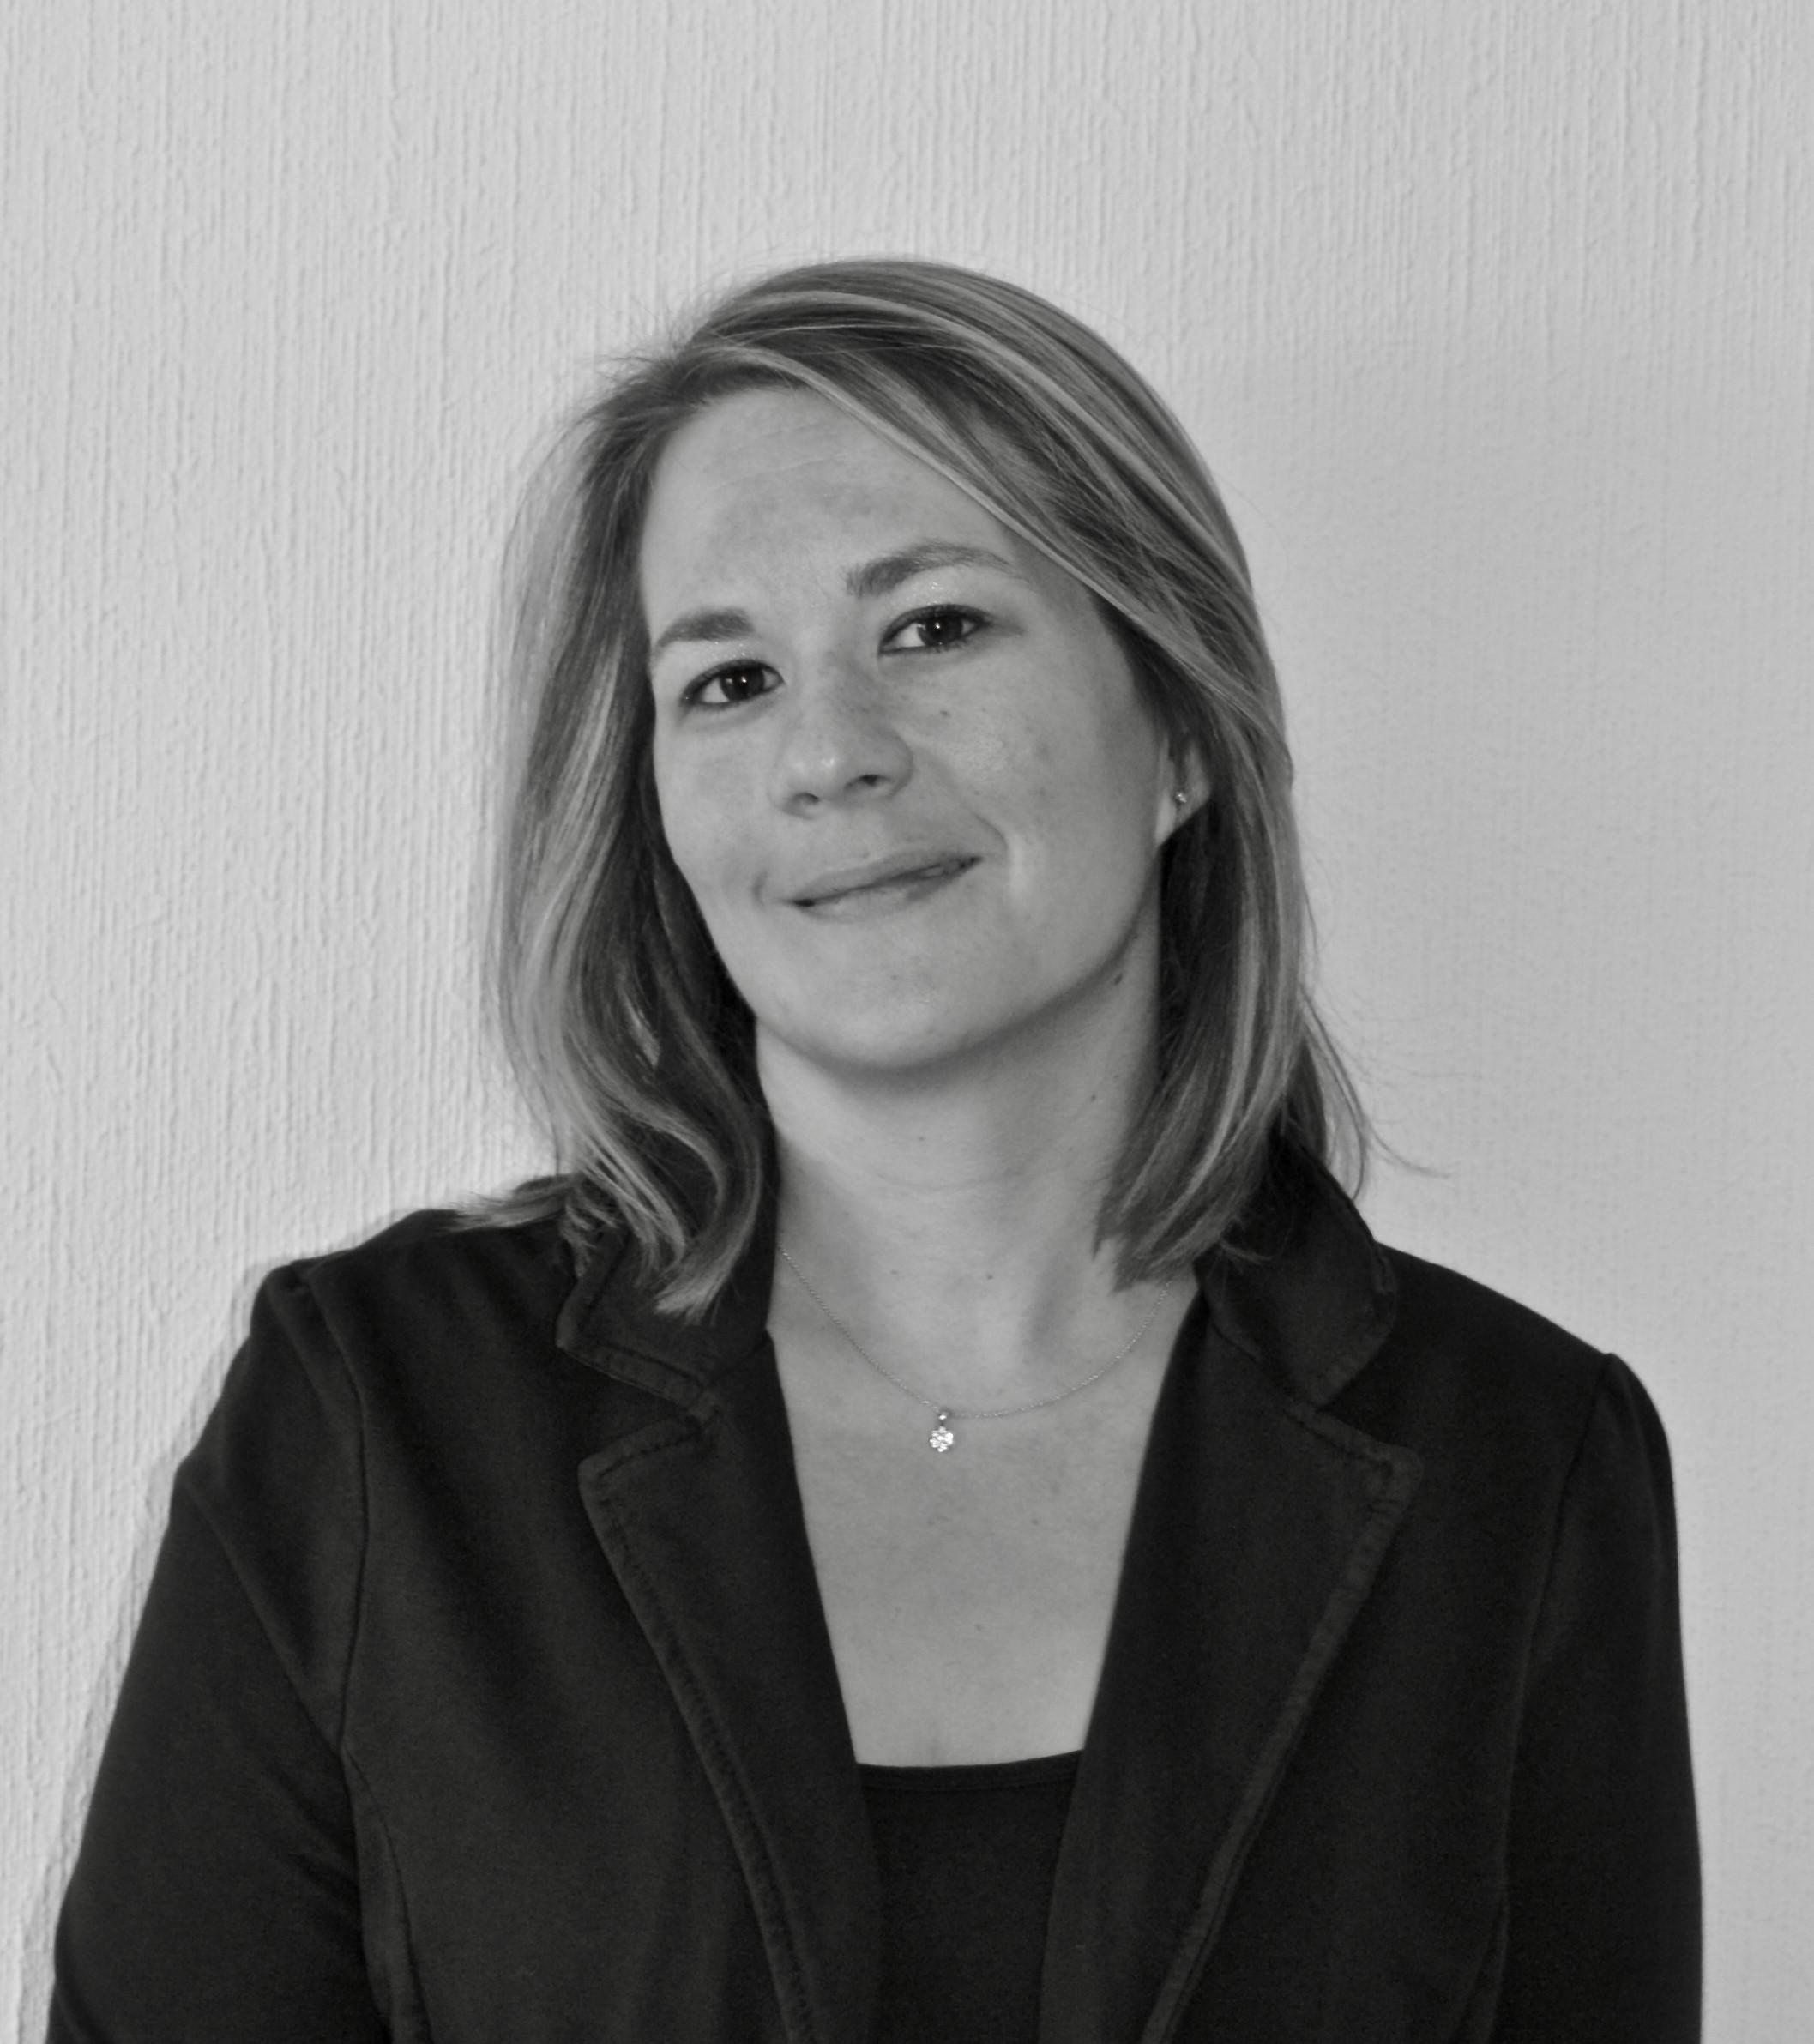 ROXANE CHAUVET-MINGARD